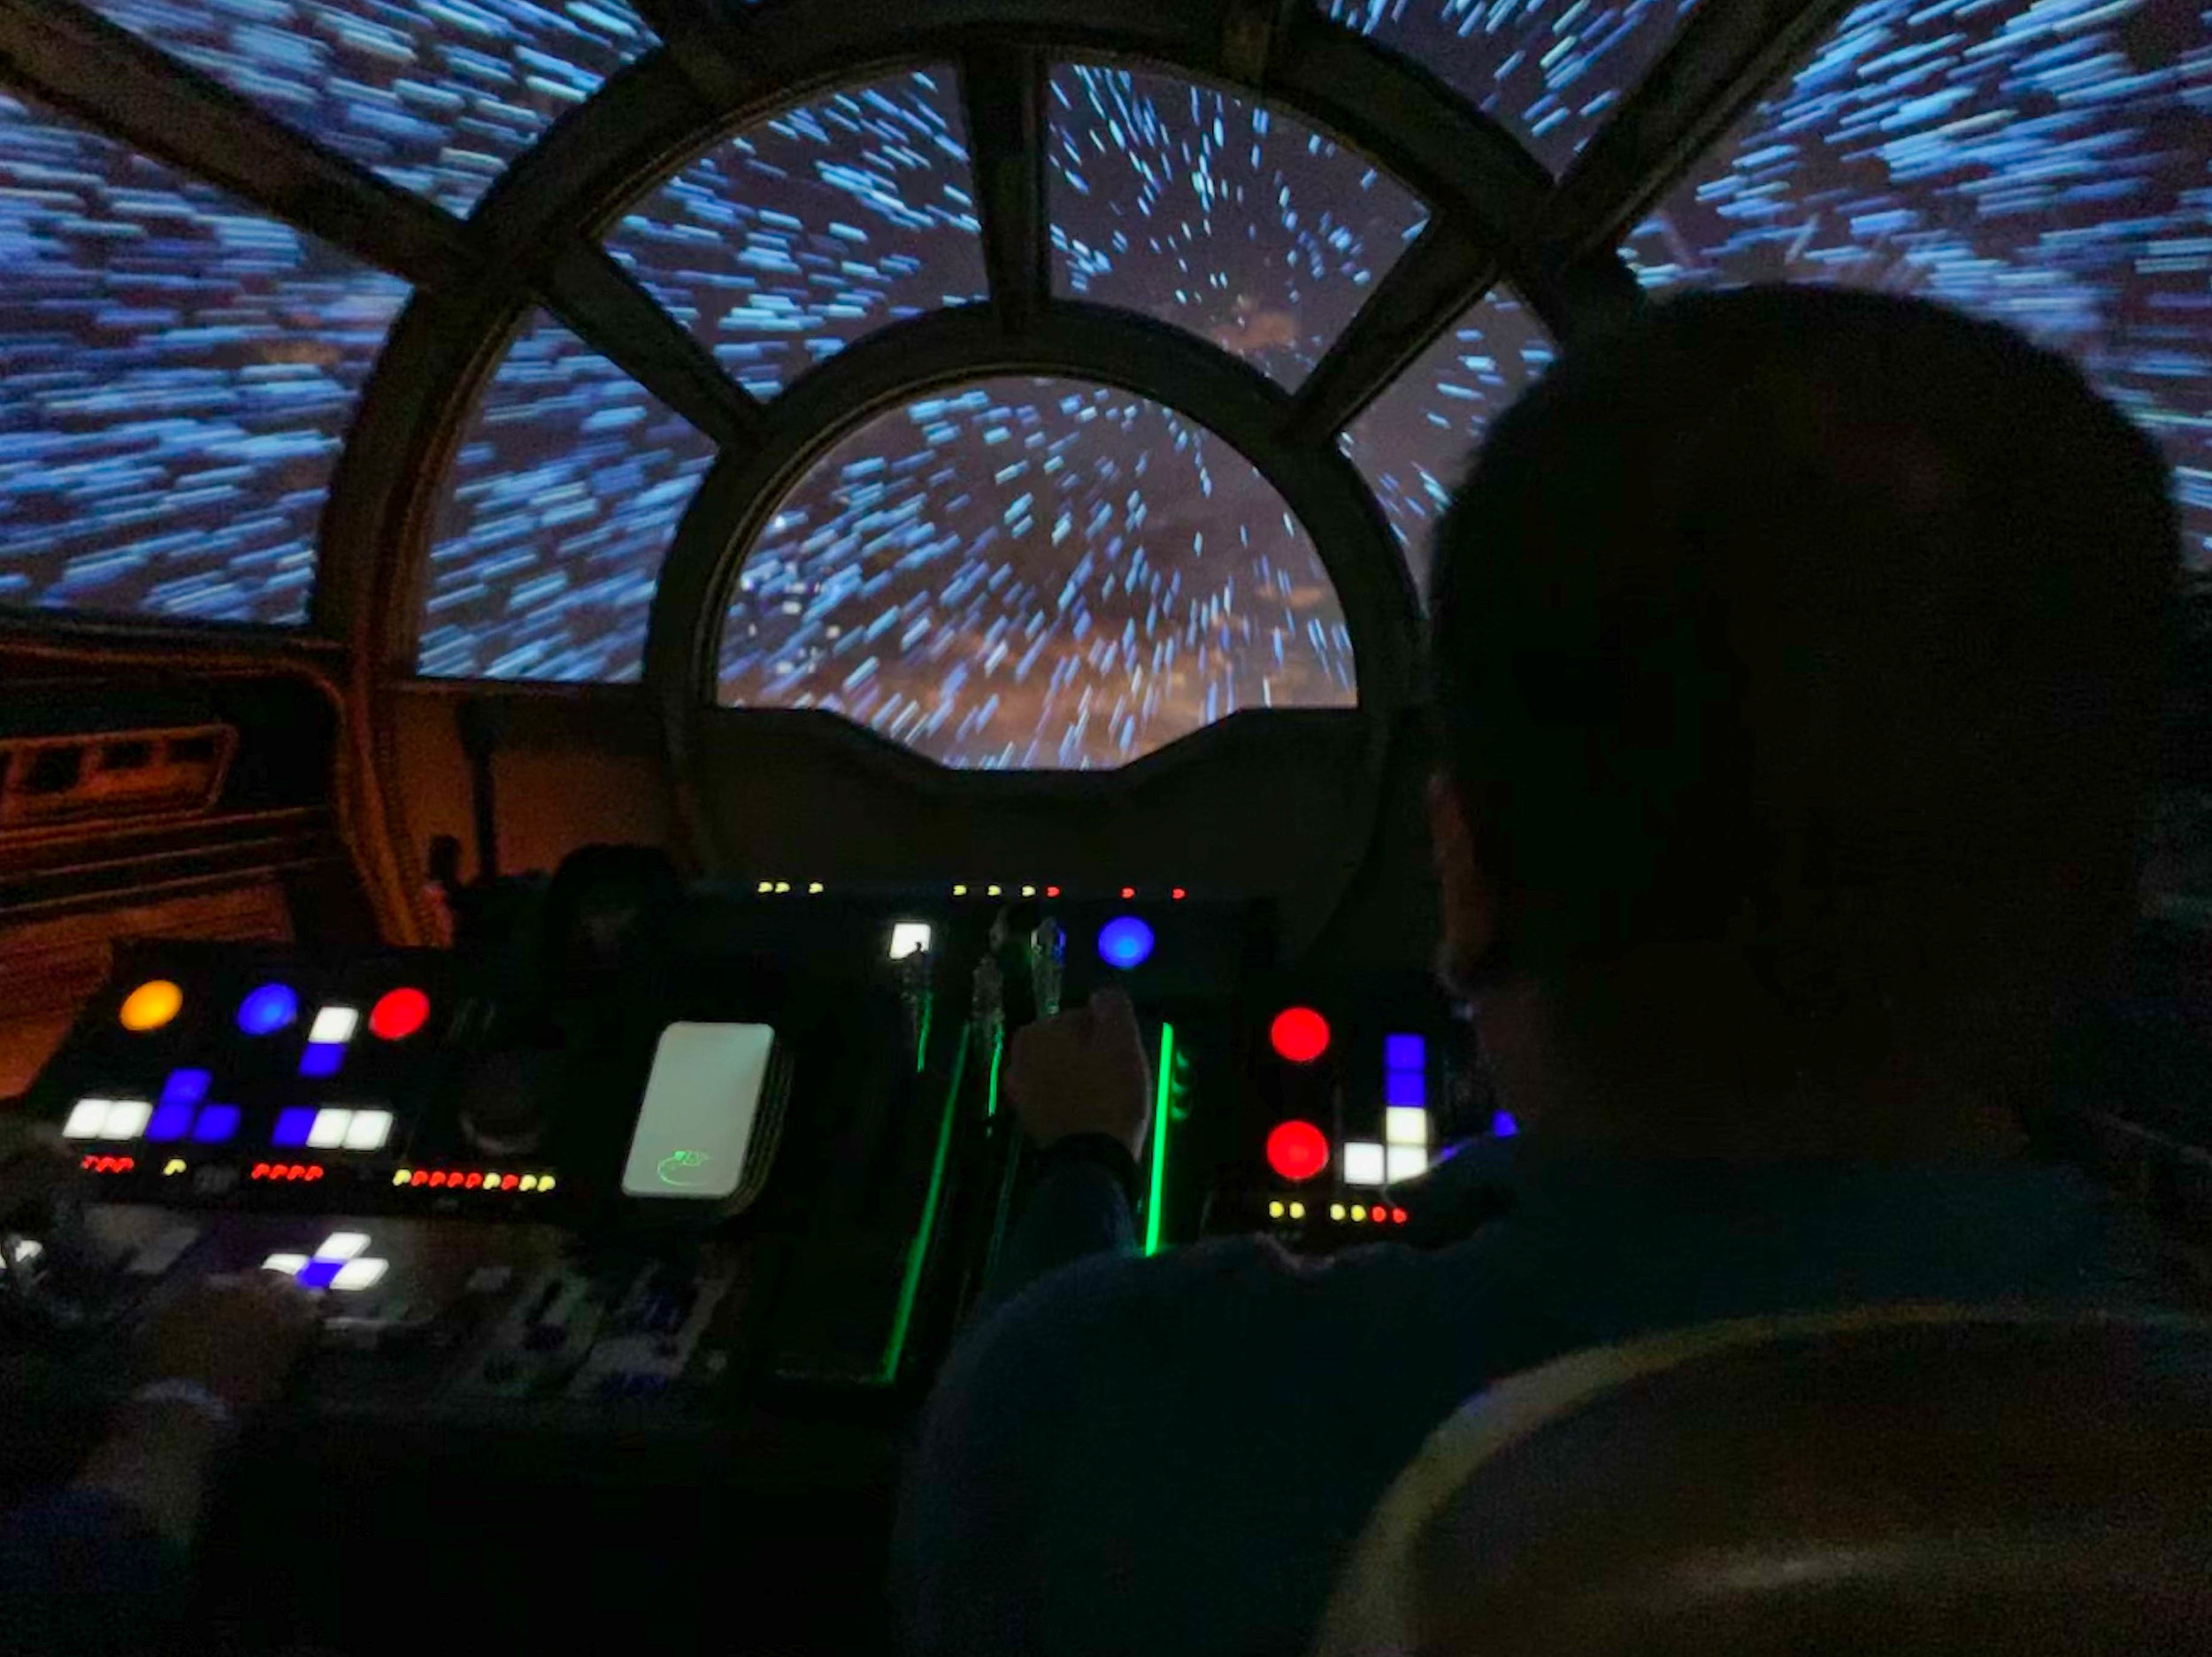 Millennium Falcon: Smuggler's Cove ride